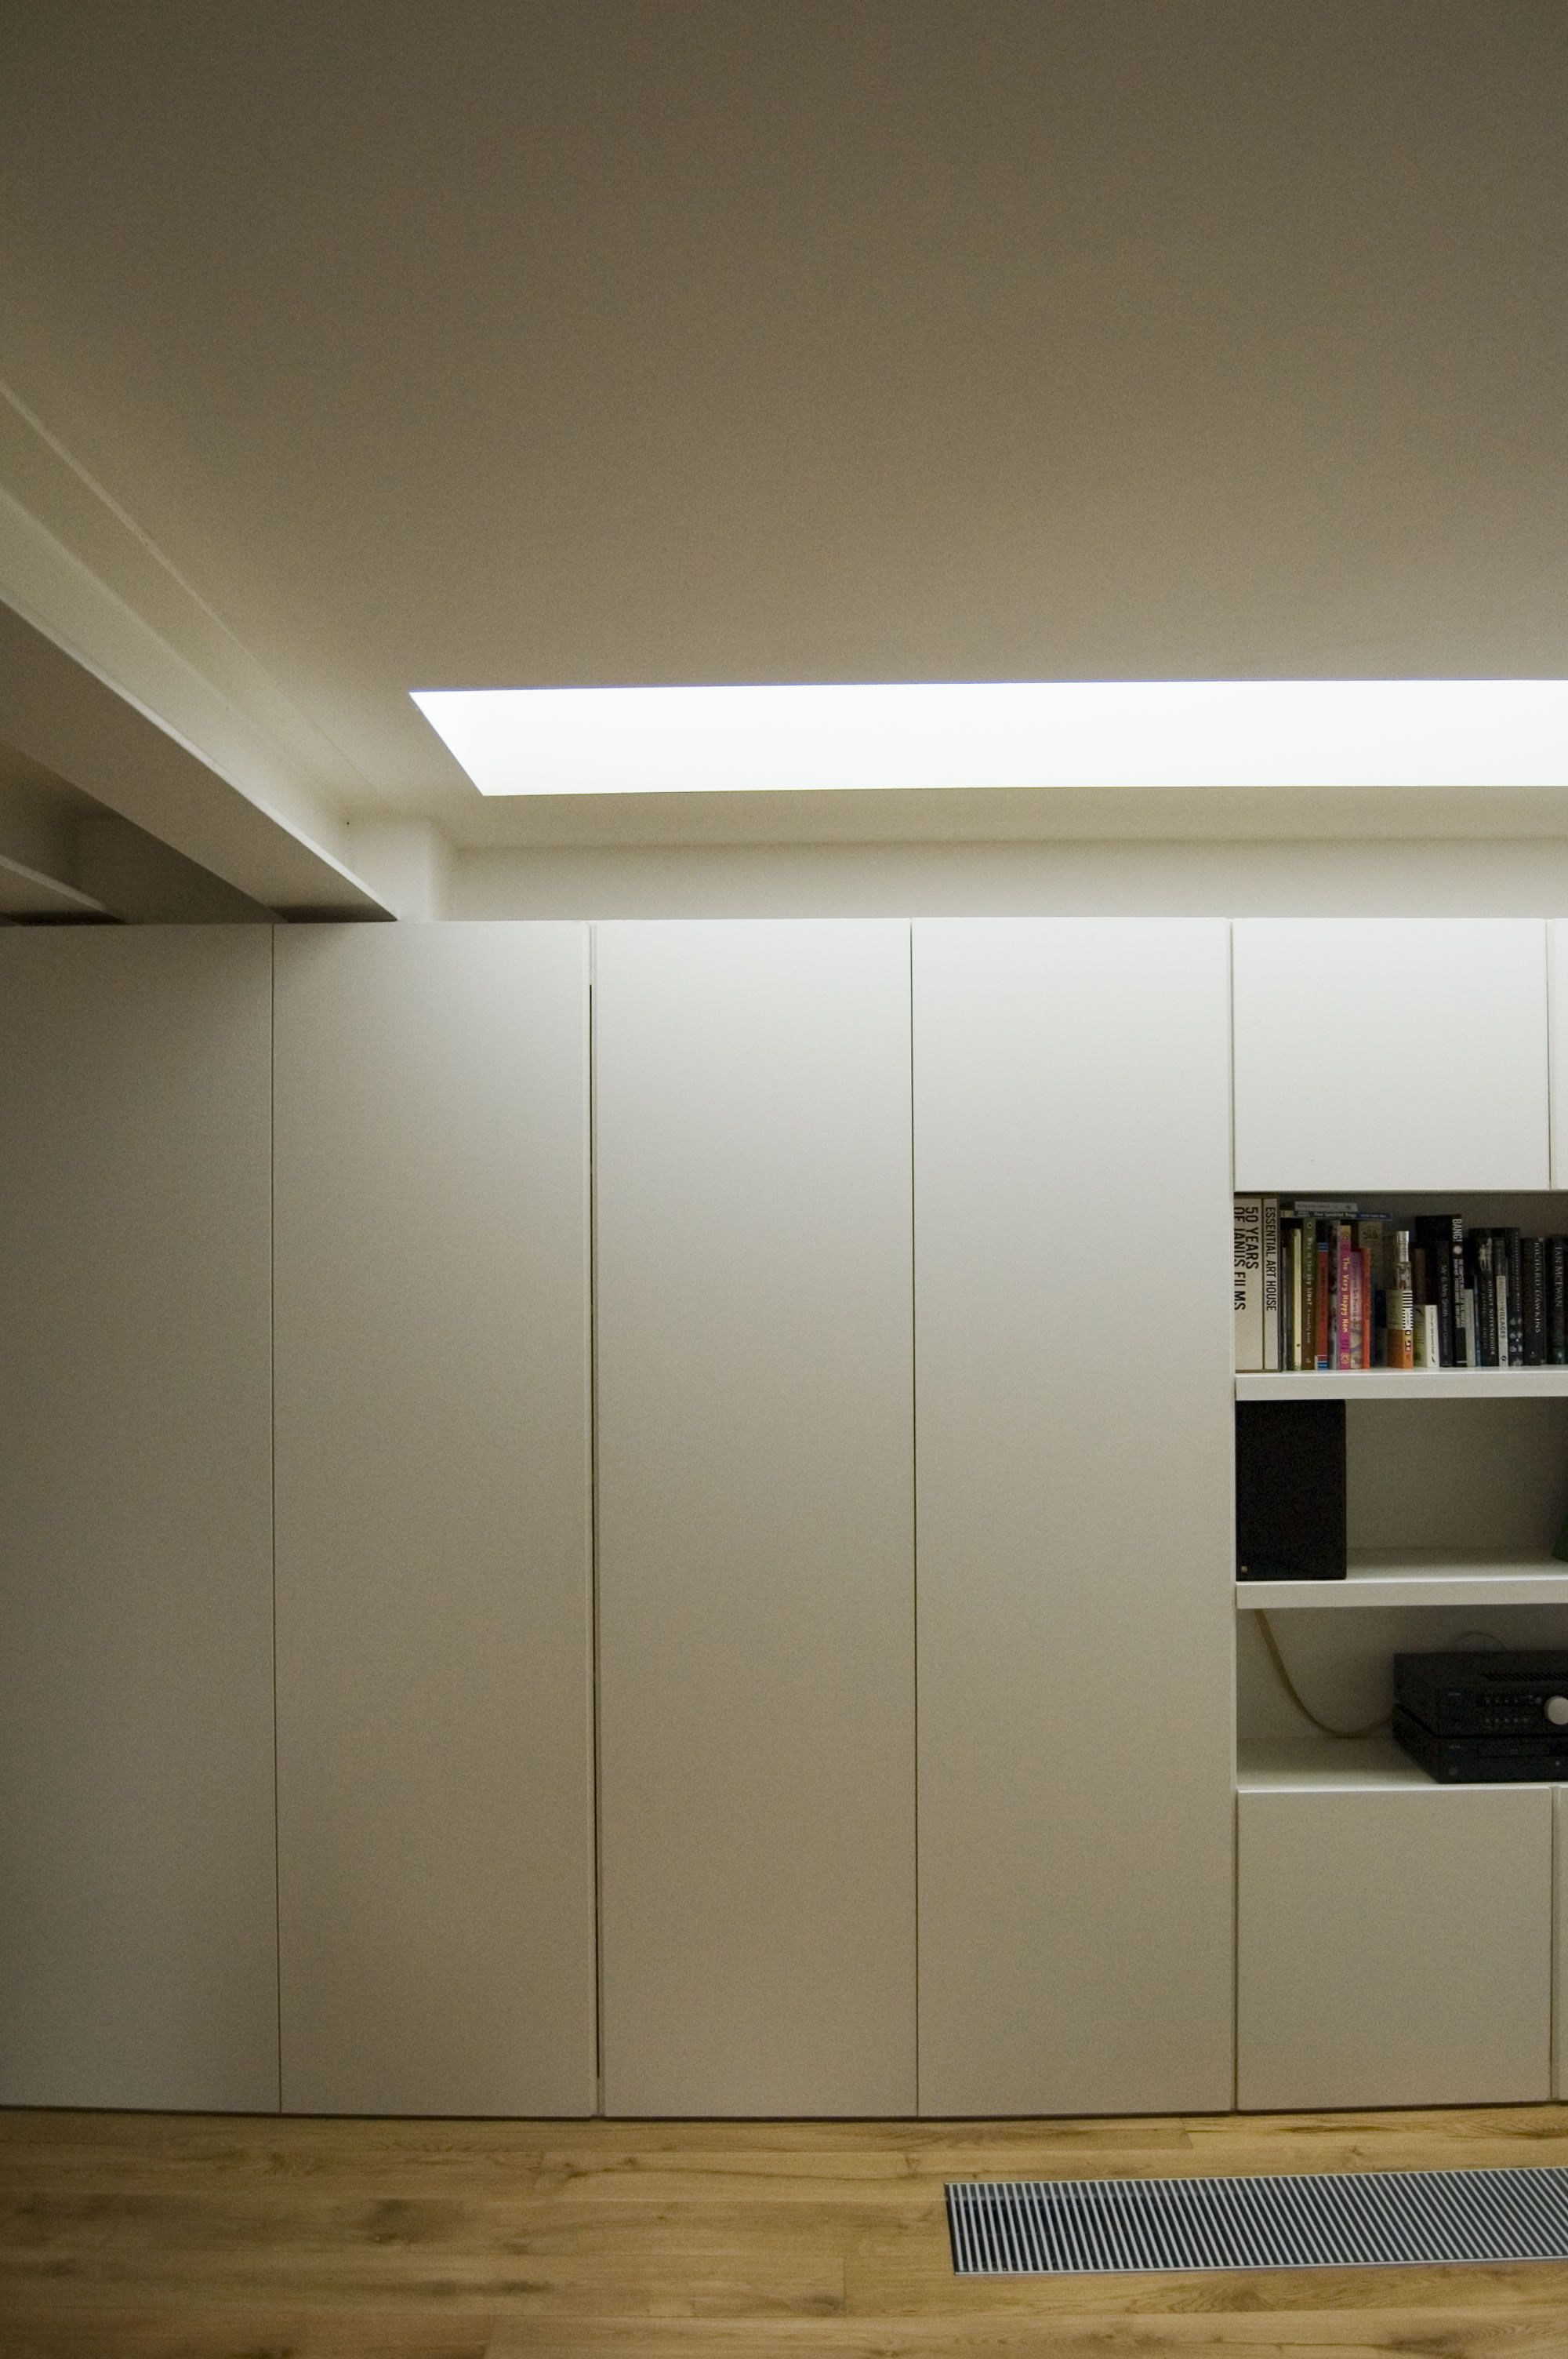 des placard discrets archi rangements bedroom storage loft house et closet doors. Black Bedroom Furniture Sets. Home Design Ideas